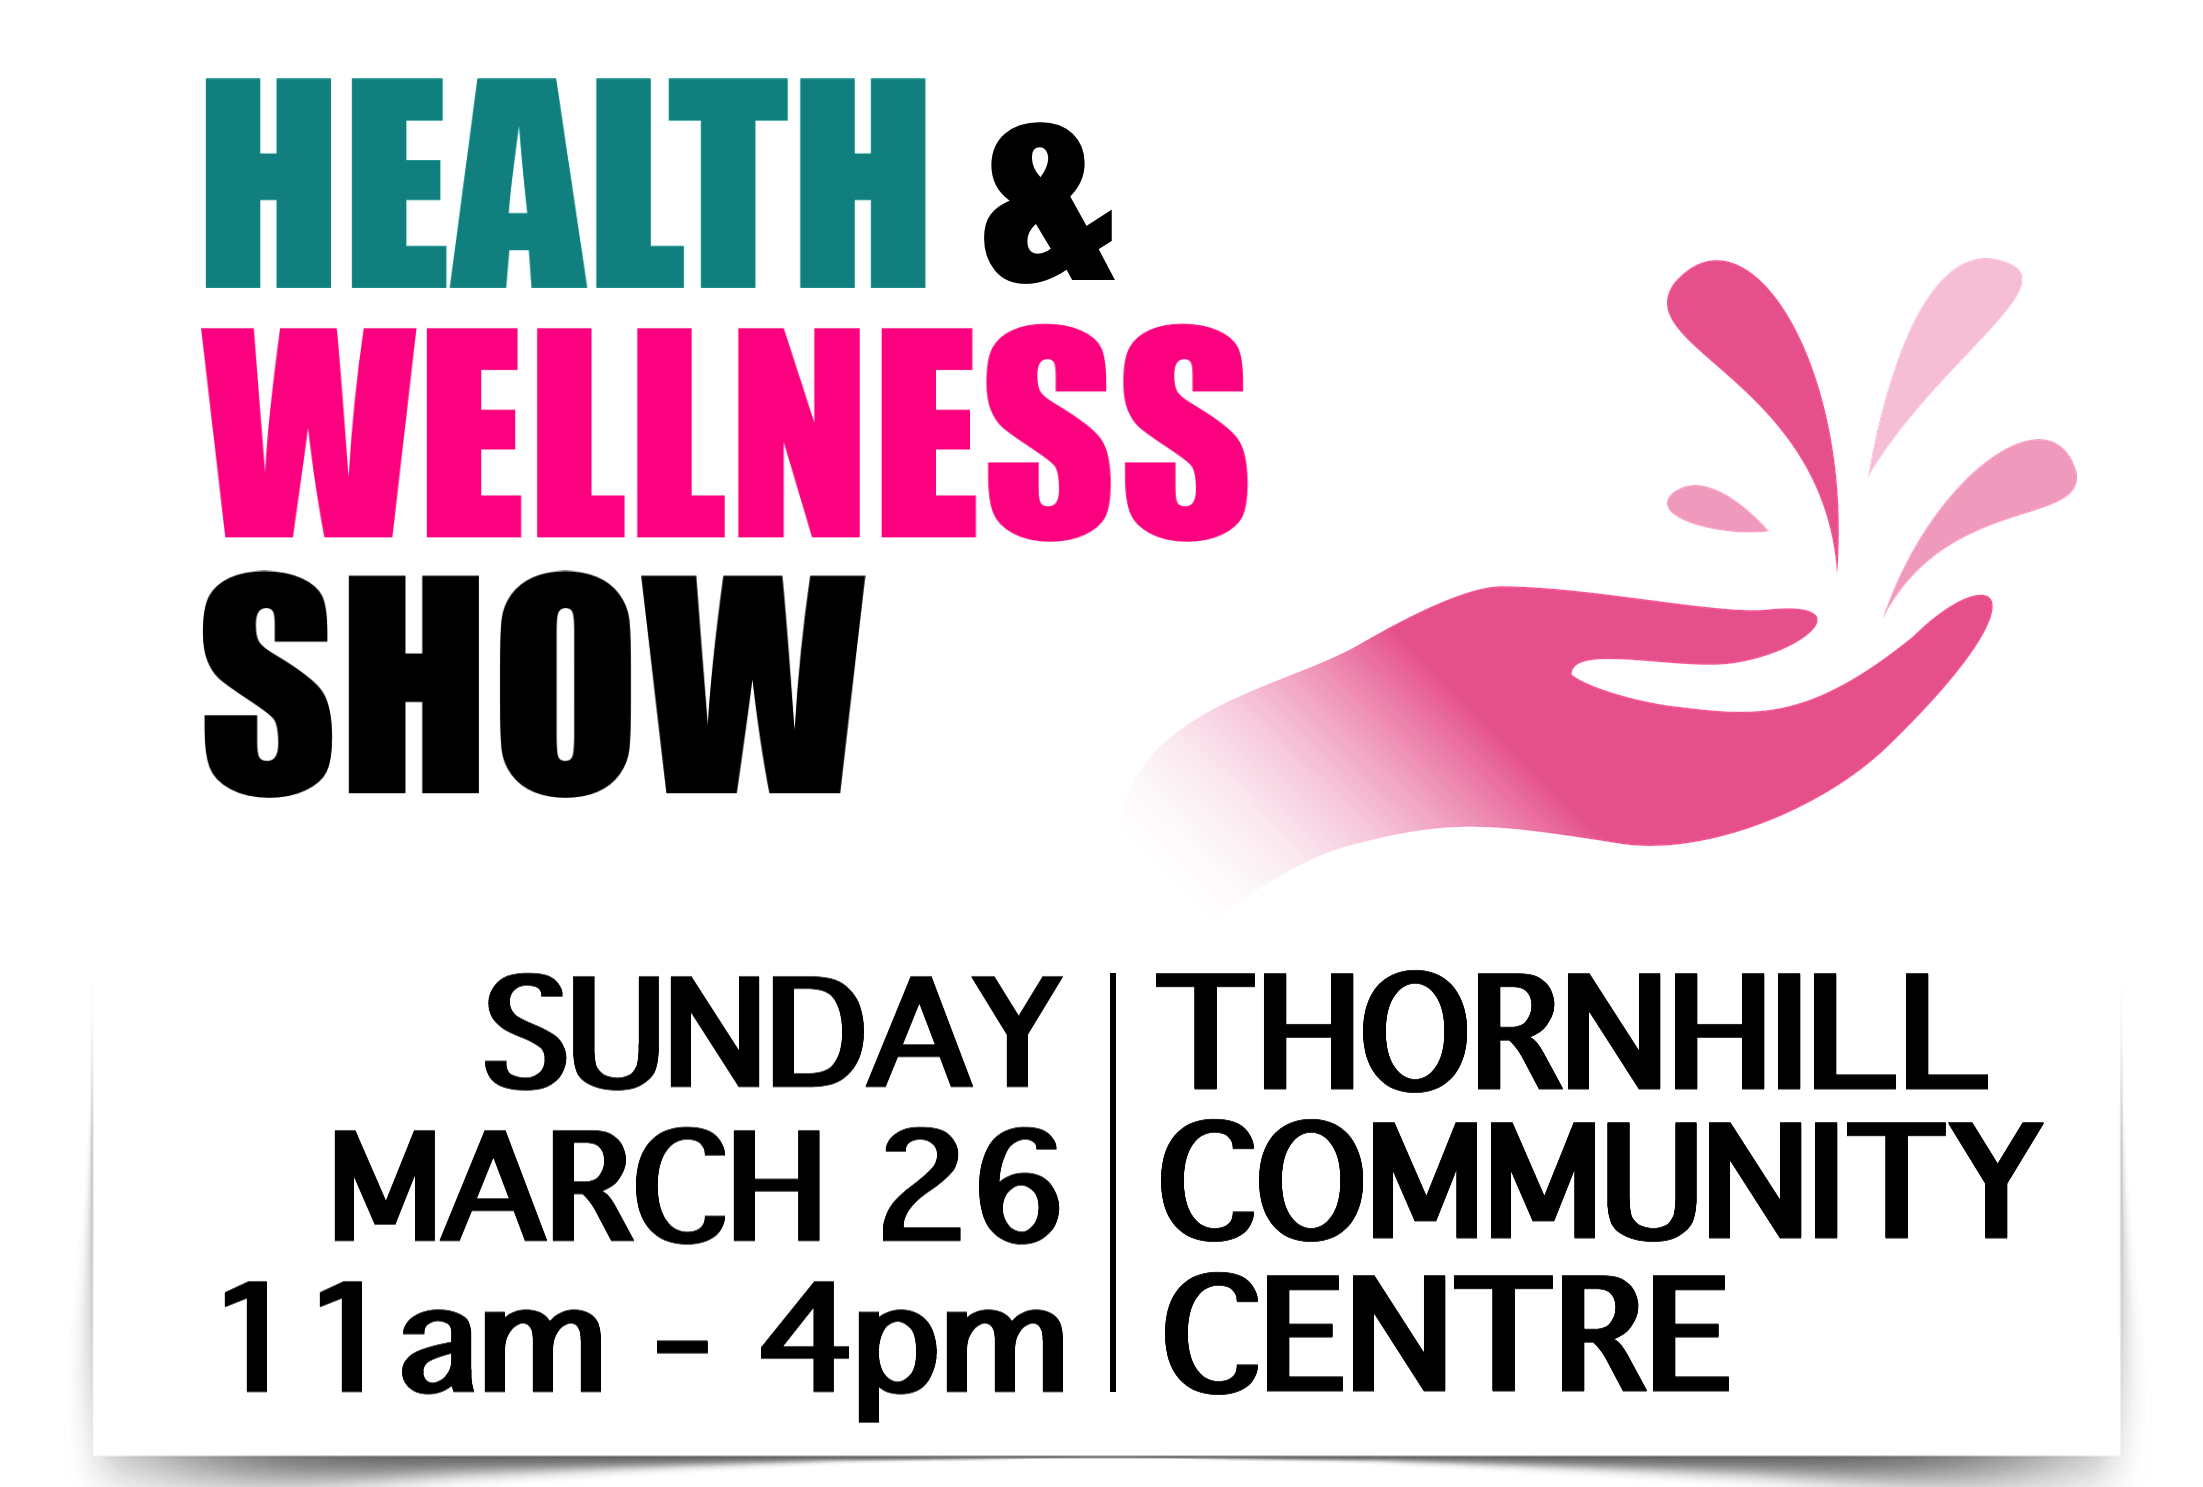 Health & Wellness Show